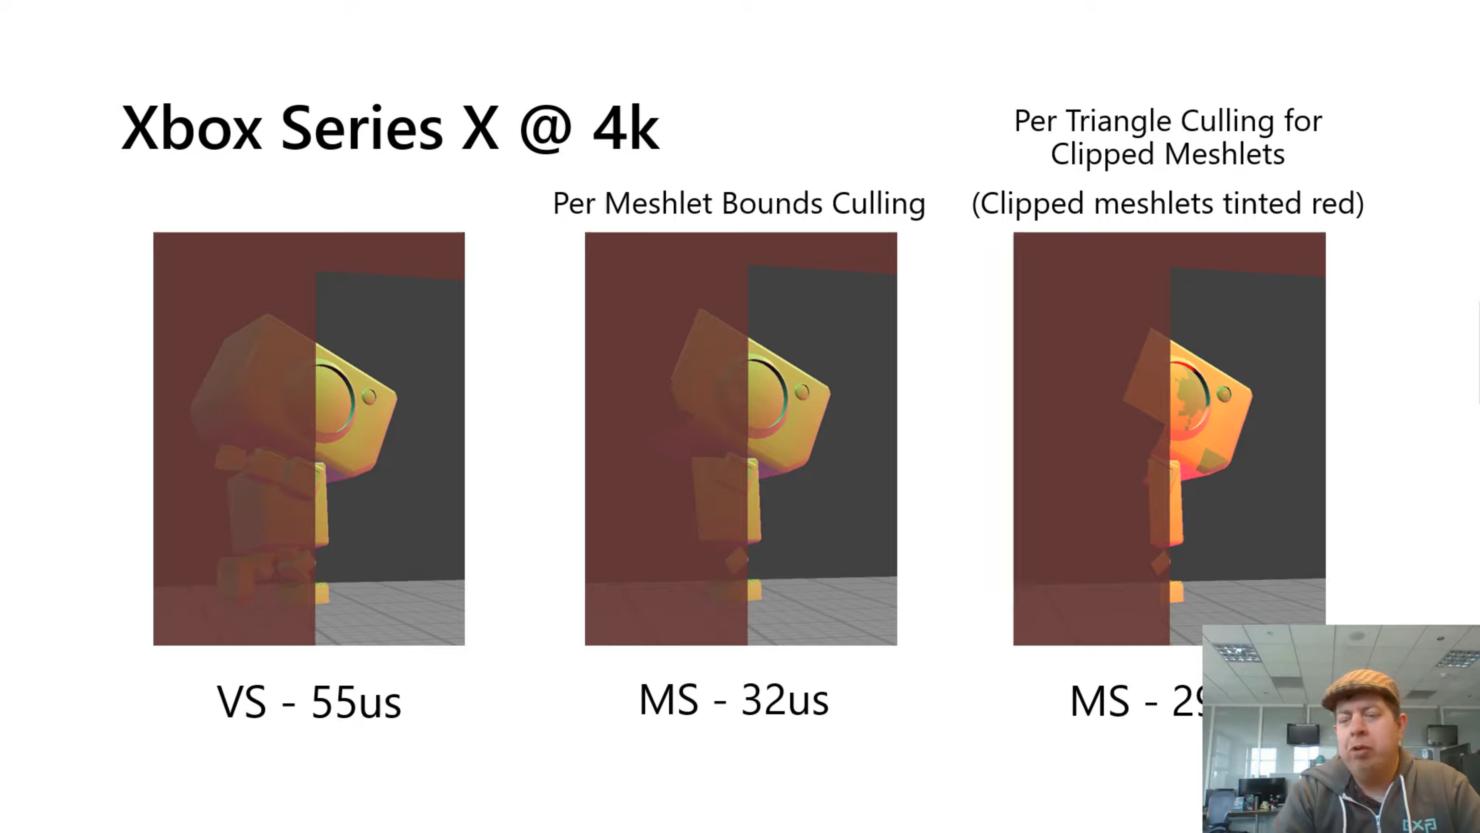 microsoft-directx-12-mesh-shaders-culling_performance_nvidia-geforce-rtx-2080-ti-xbox-series-x_1